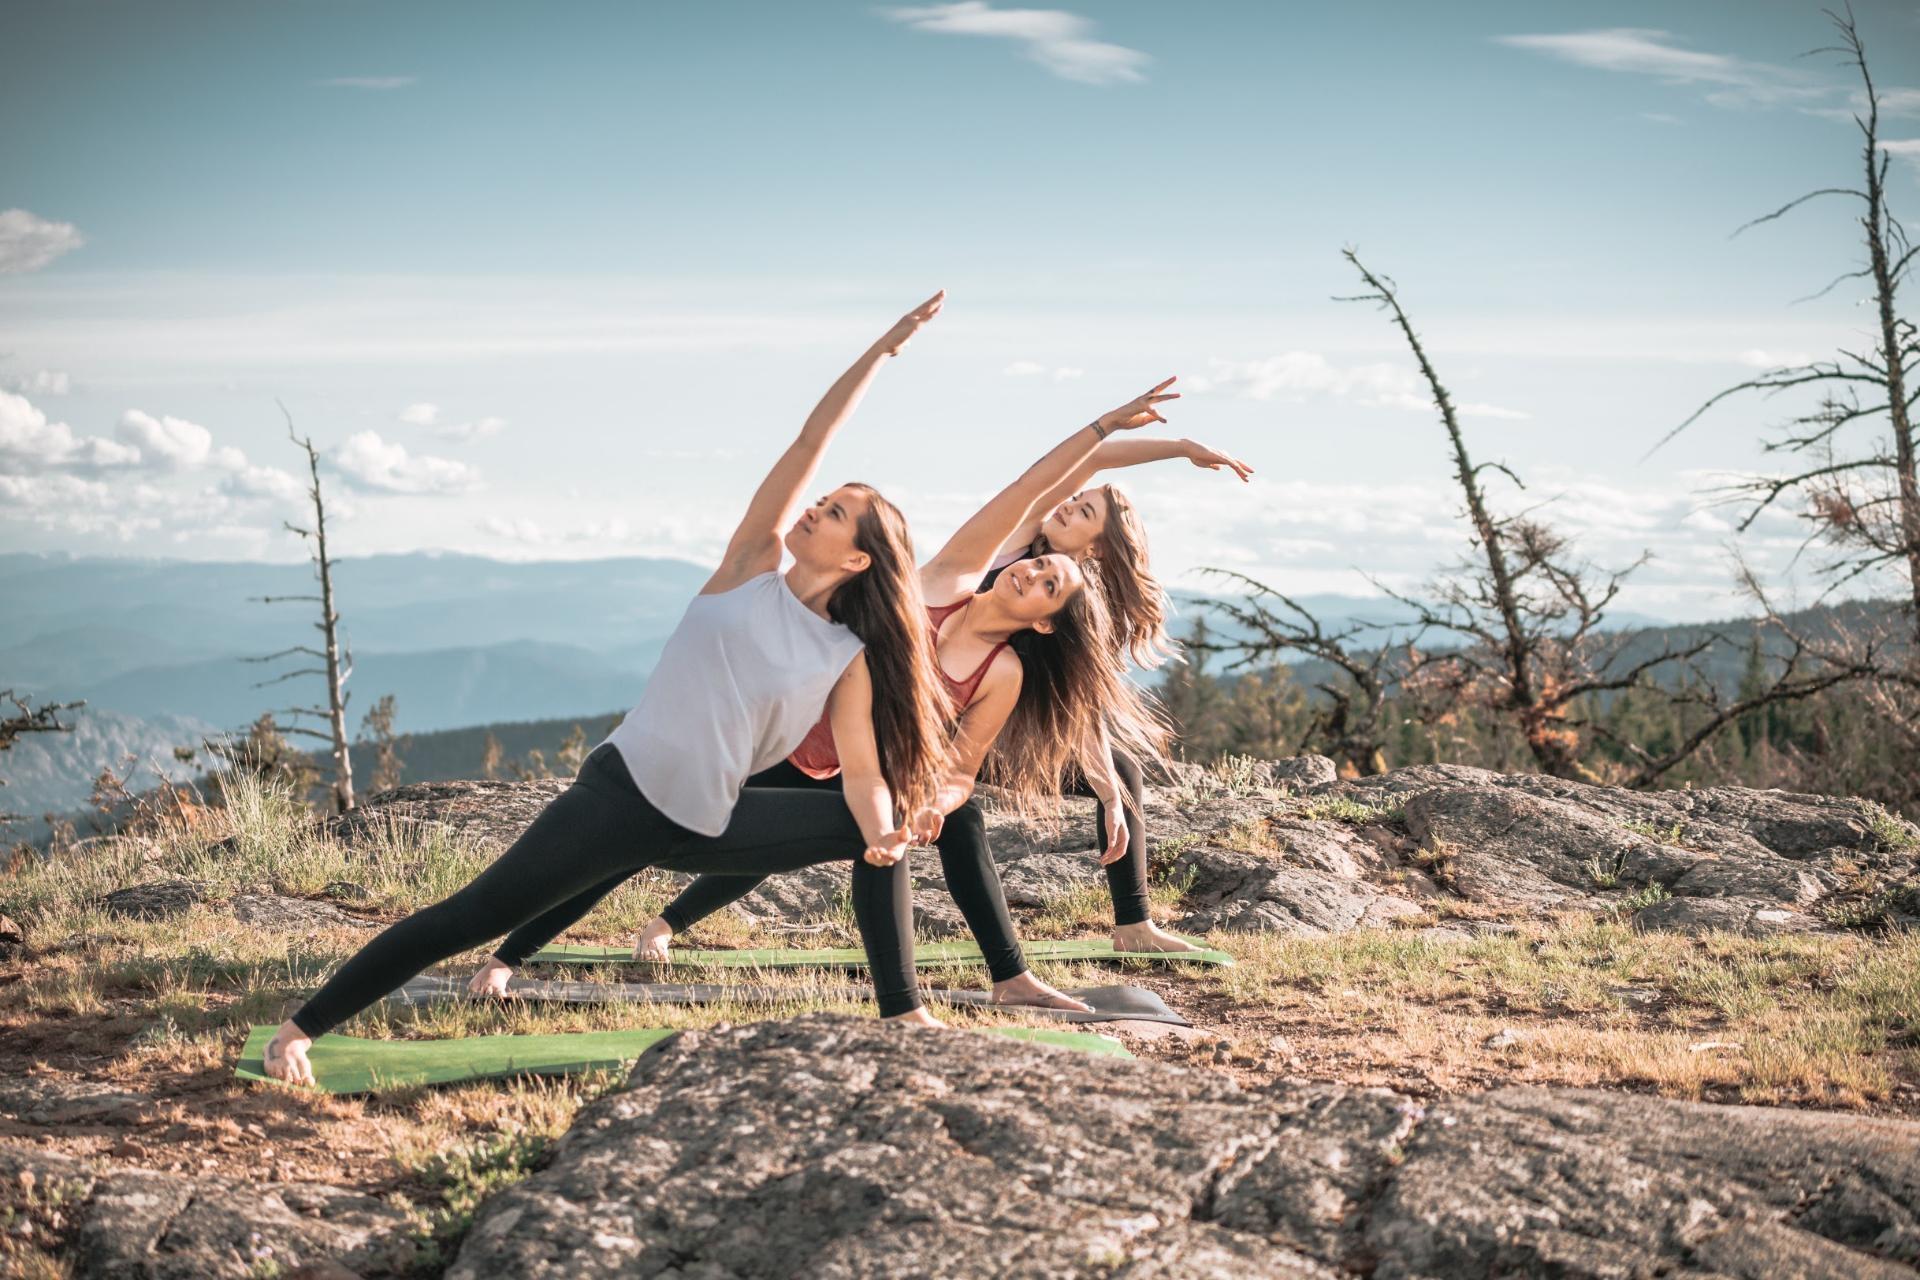 Yoga Takes Flight in the Okanagan